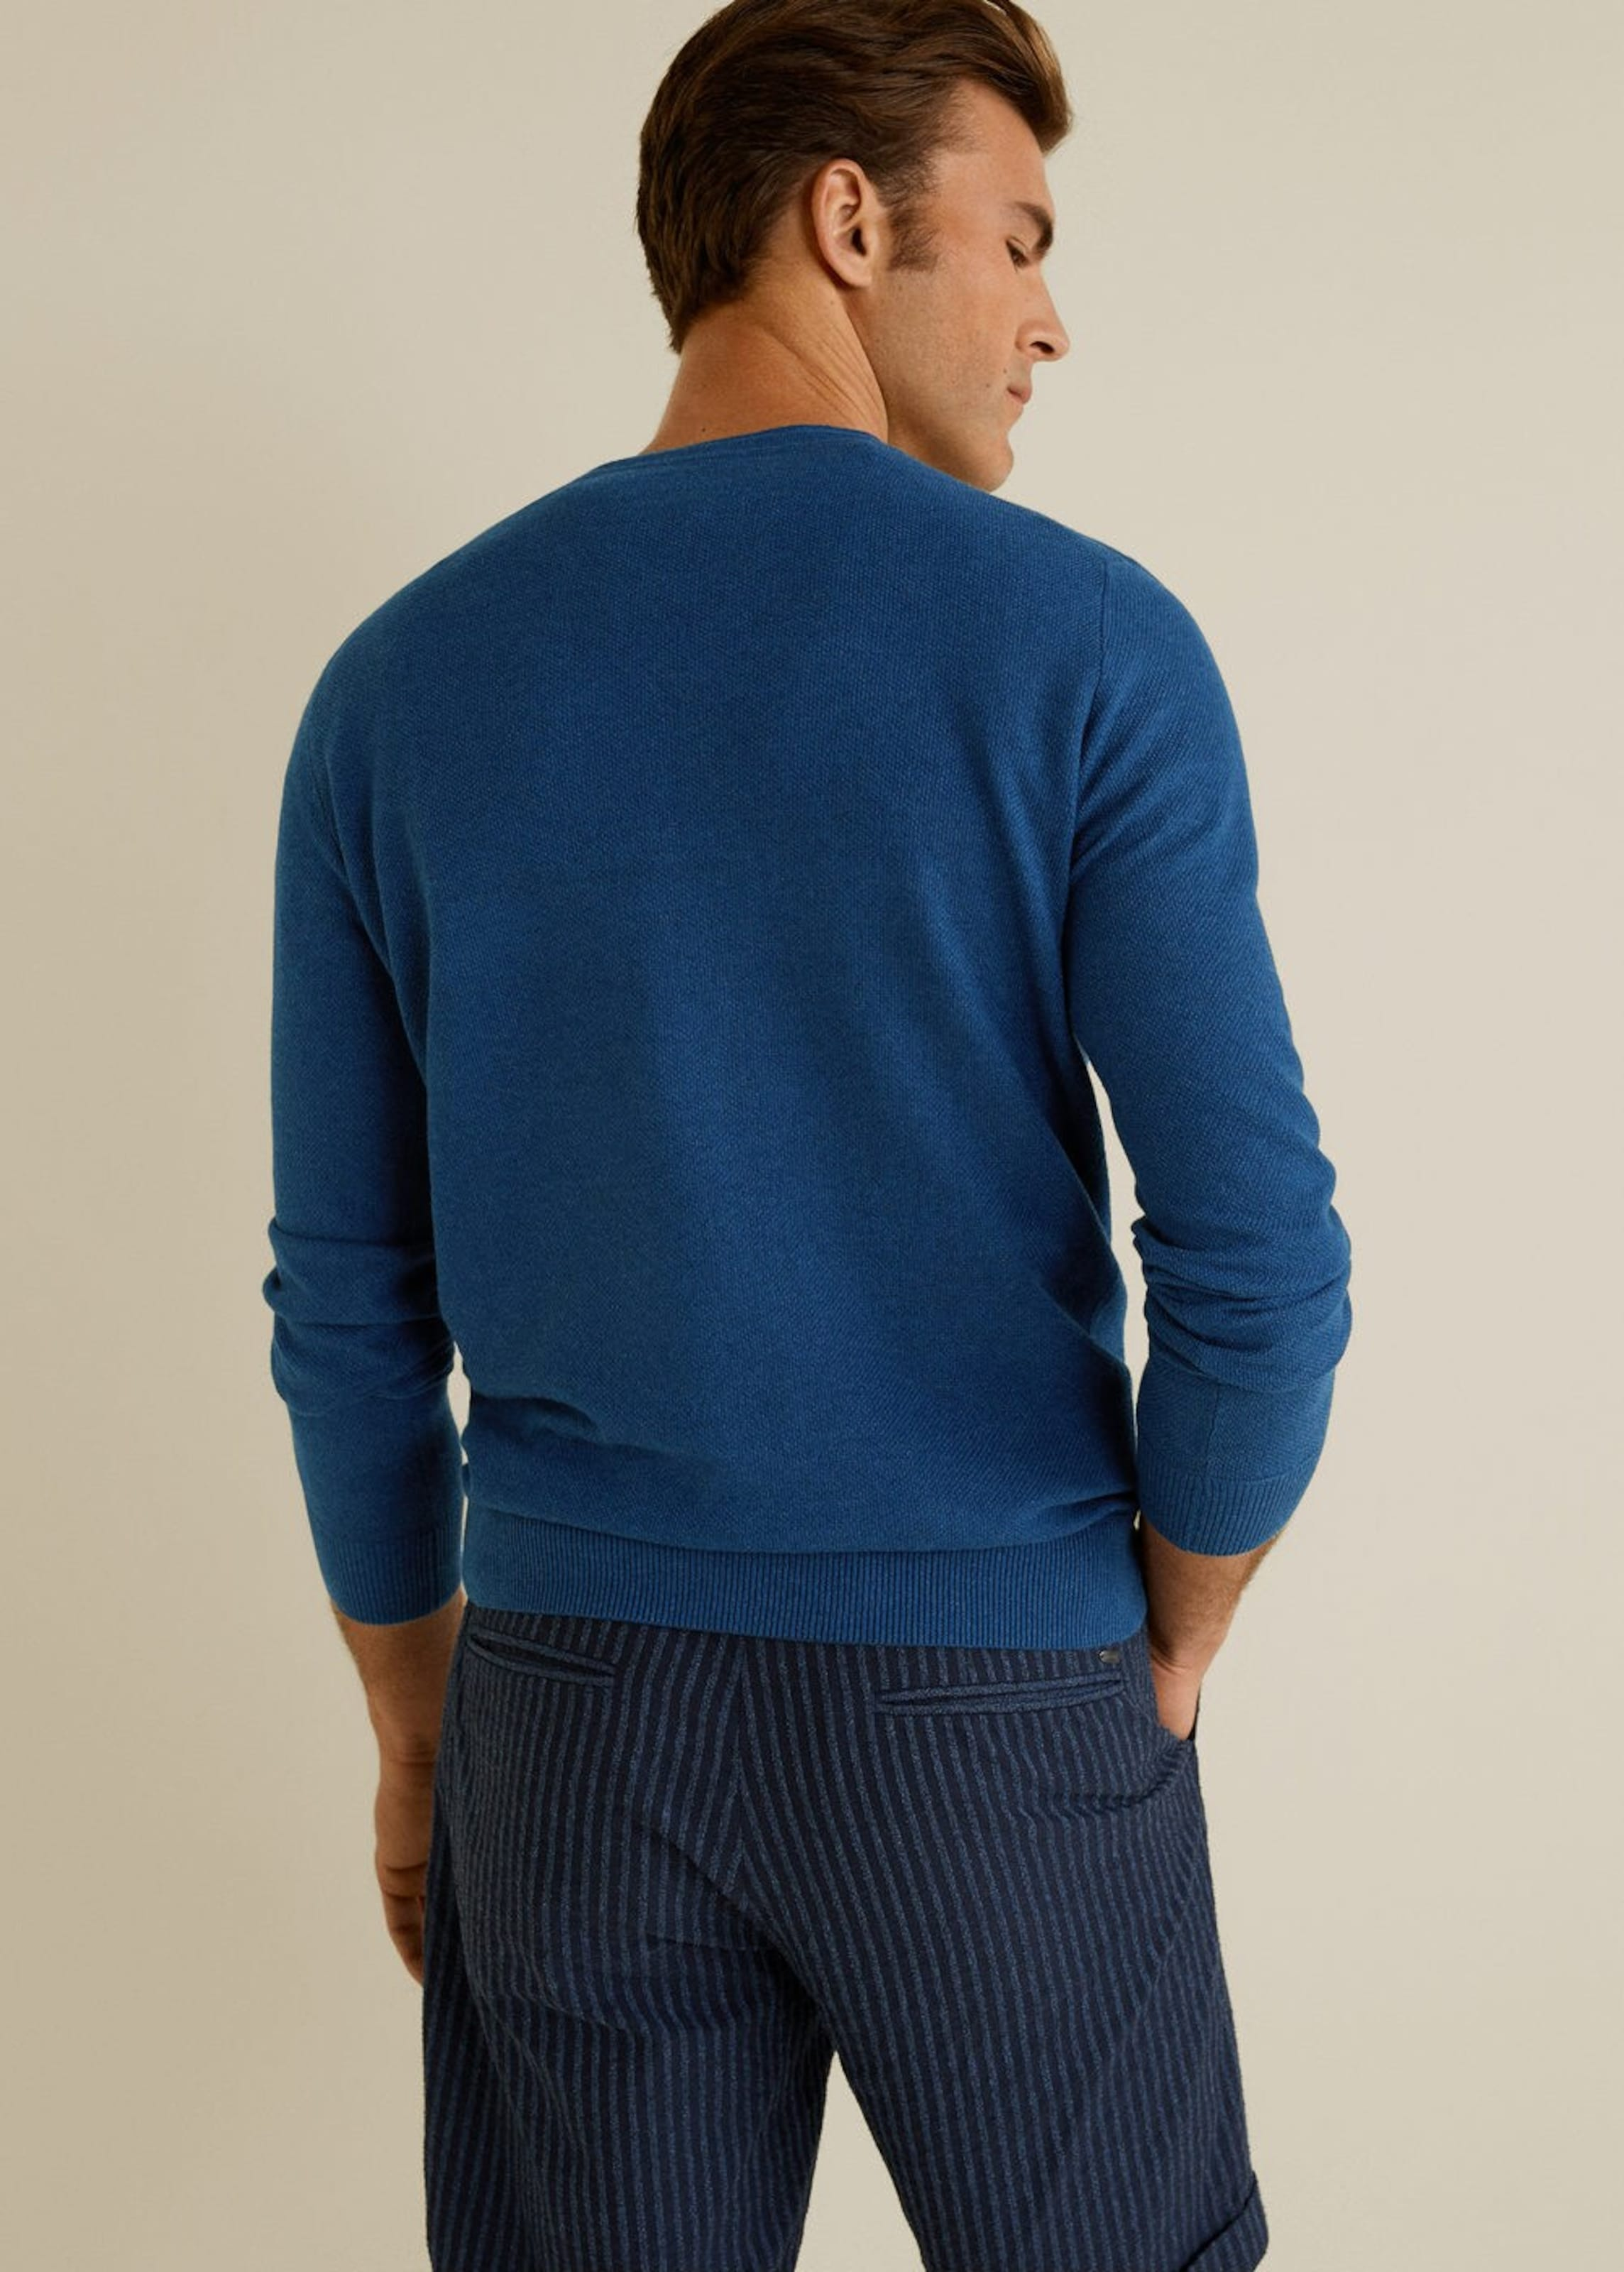 Pullover 'tenv' Mango Blau In Man 8vnOmN0w